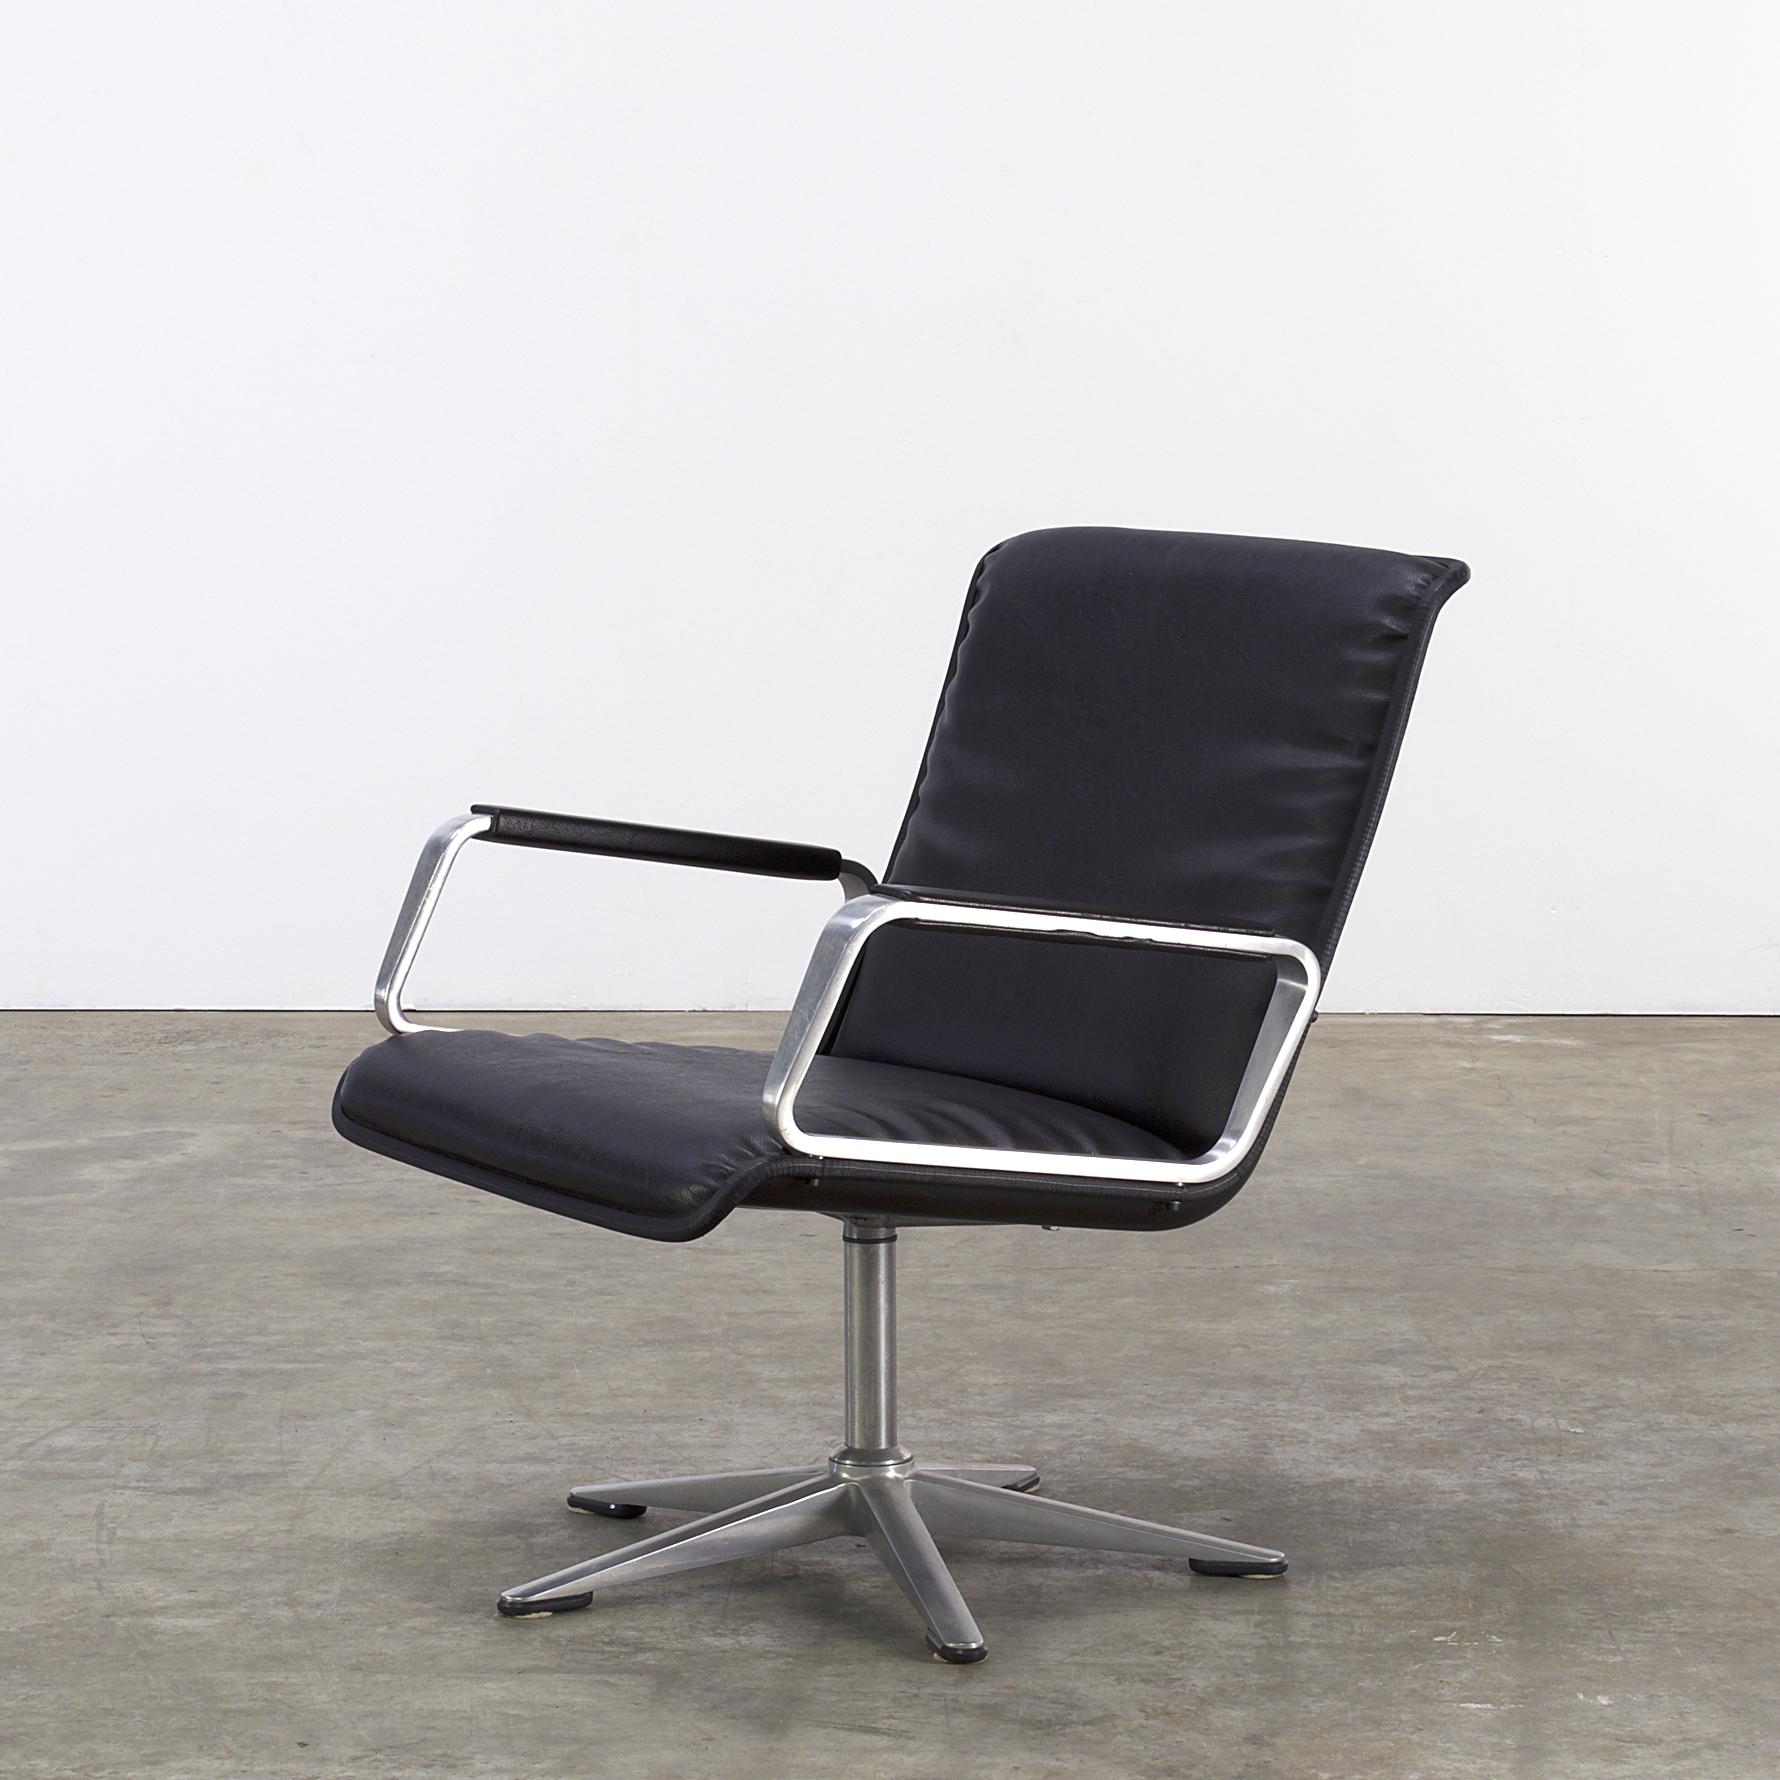 Lounge Stoel Retro.70s Chair Design Zosmun